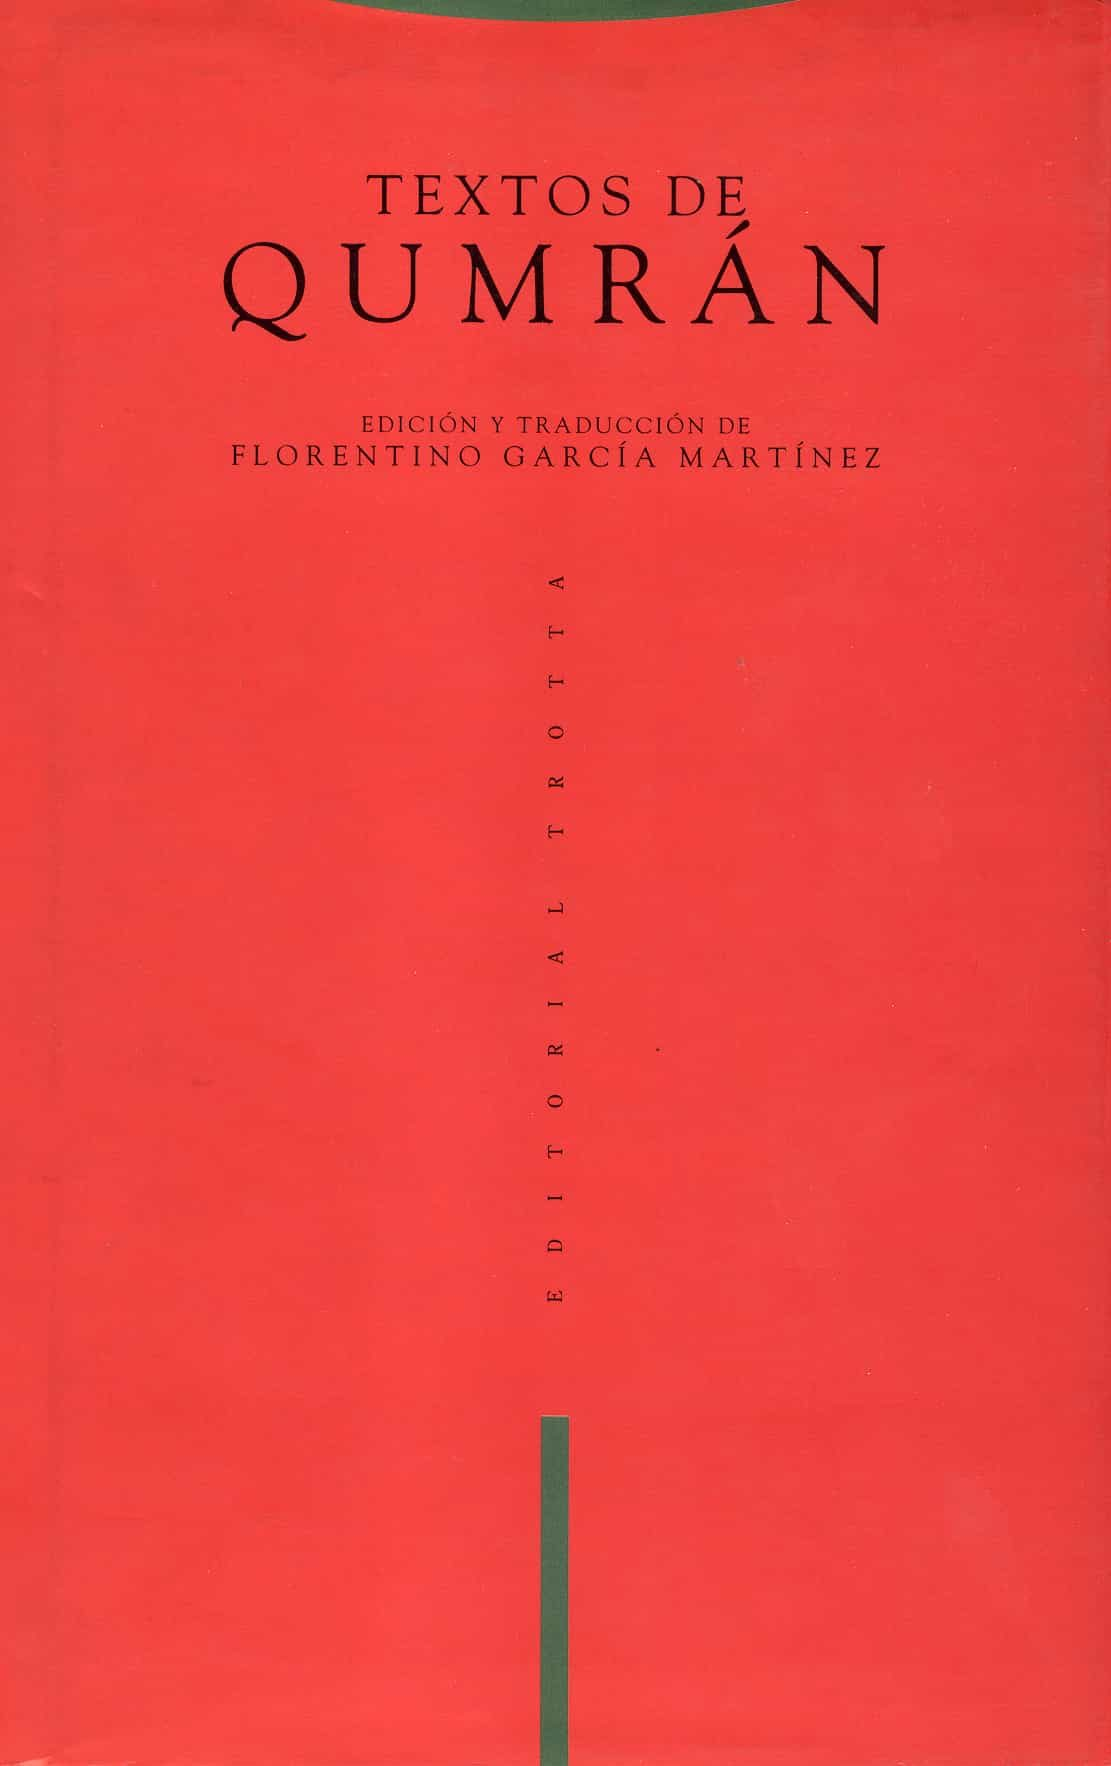 textos de qumran (6ª ed.)-f. garcia martinez-9788487699443